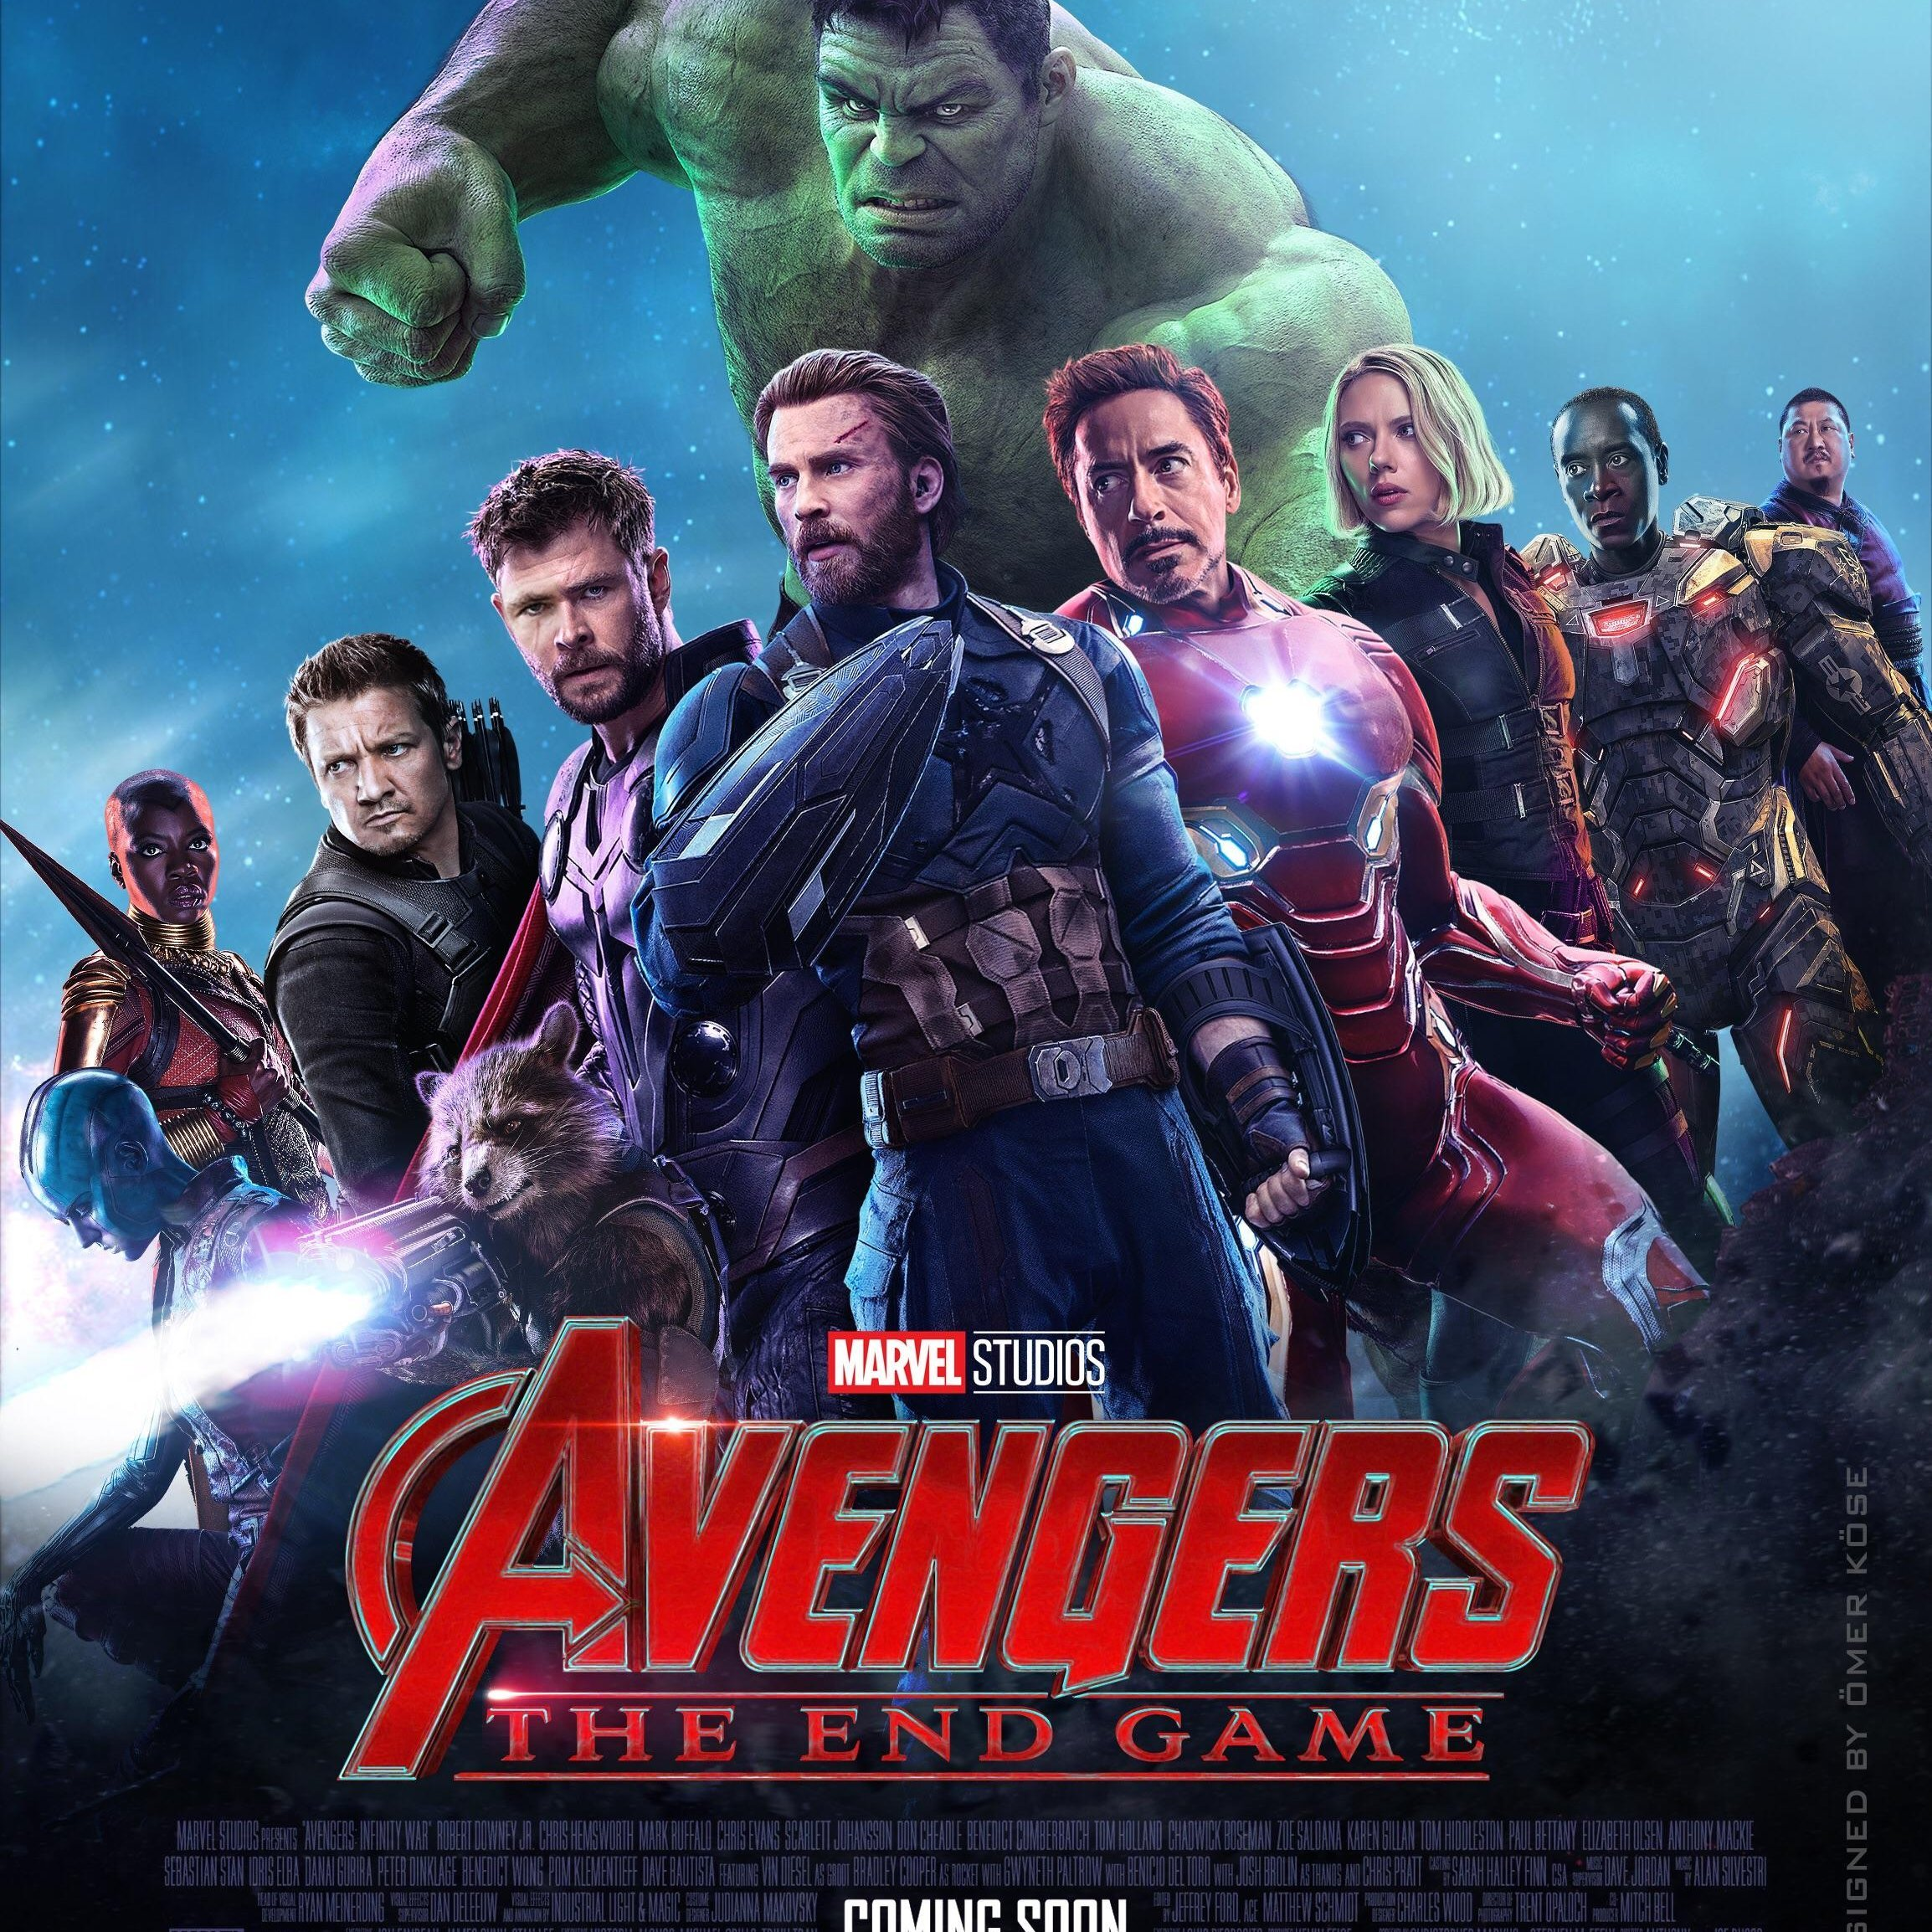 guarda**avengers endgame streaming ita -(openload/cb01)